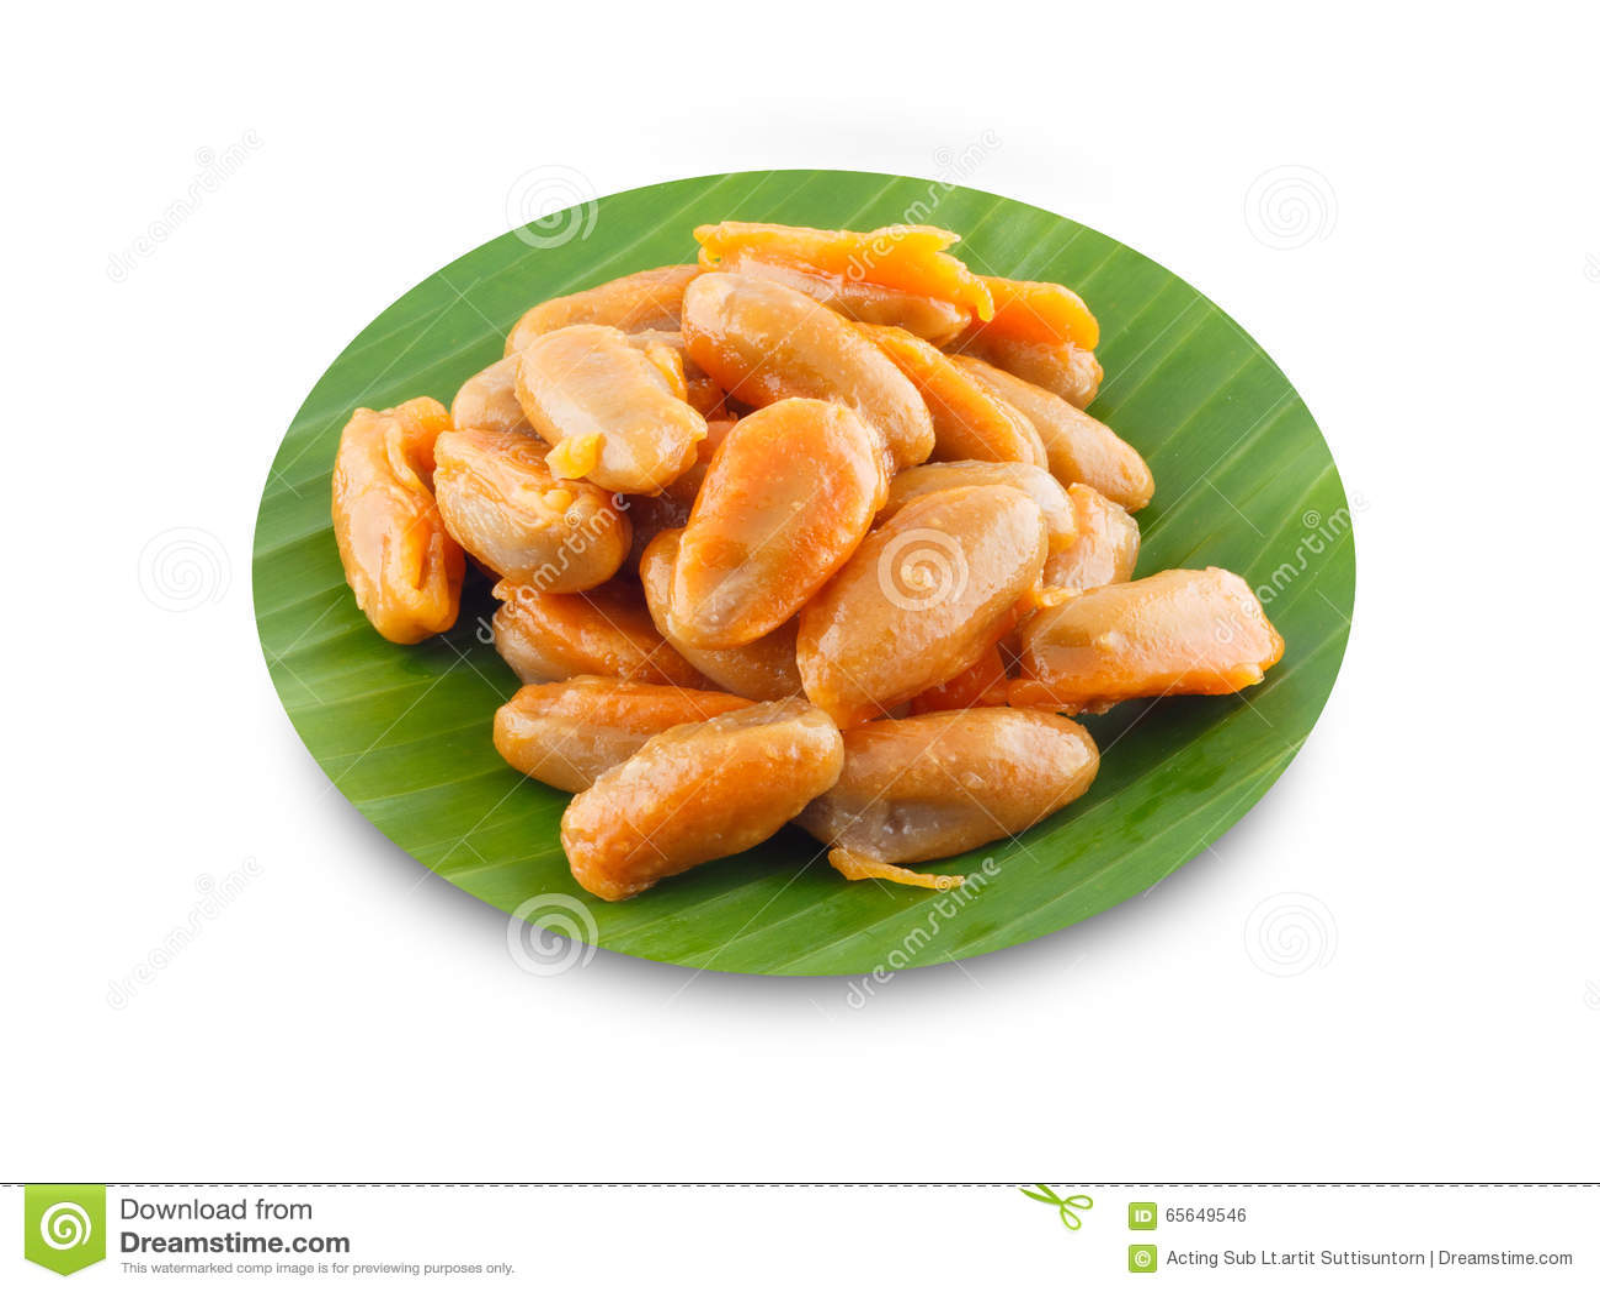 Haricot-pâte, dessert traditionnel thaïlandais